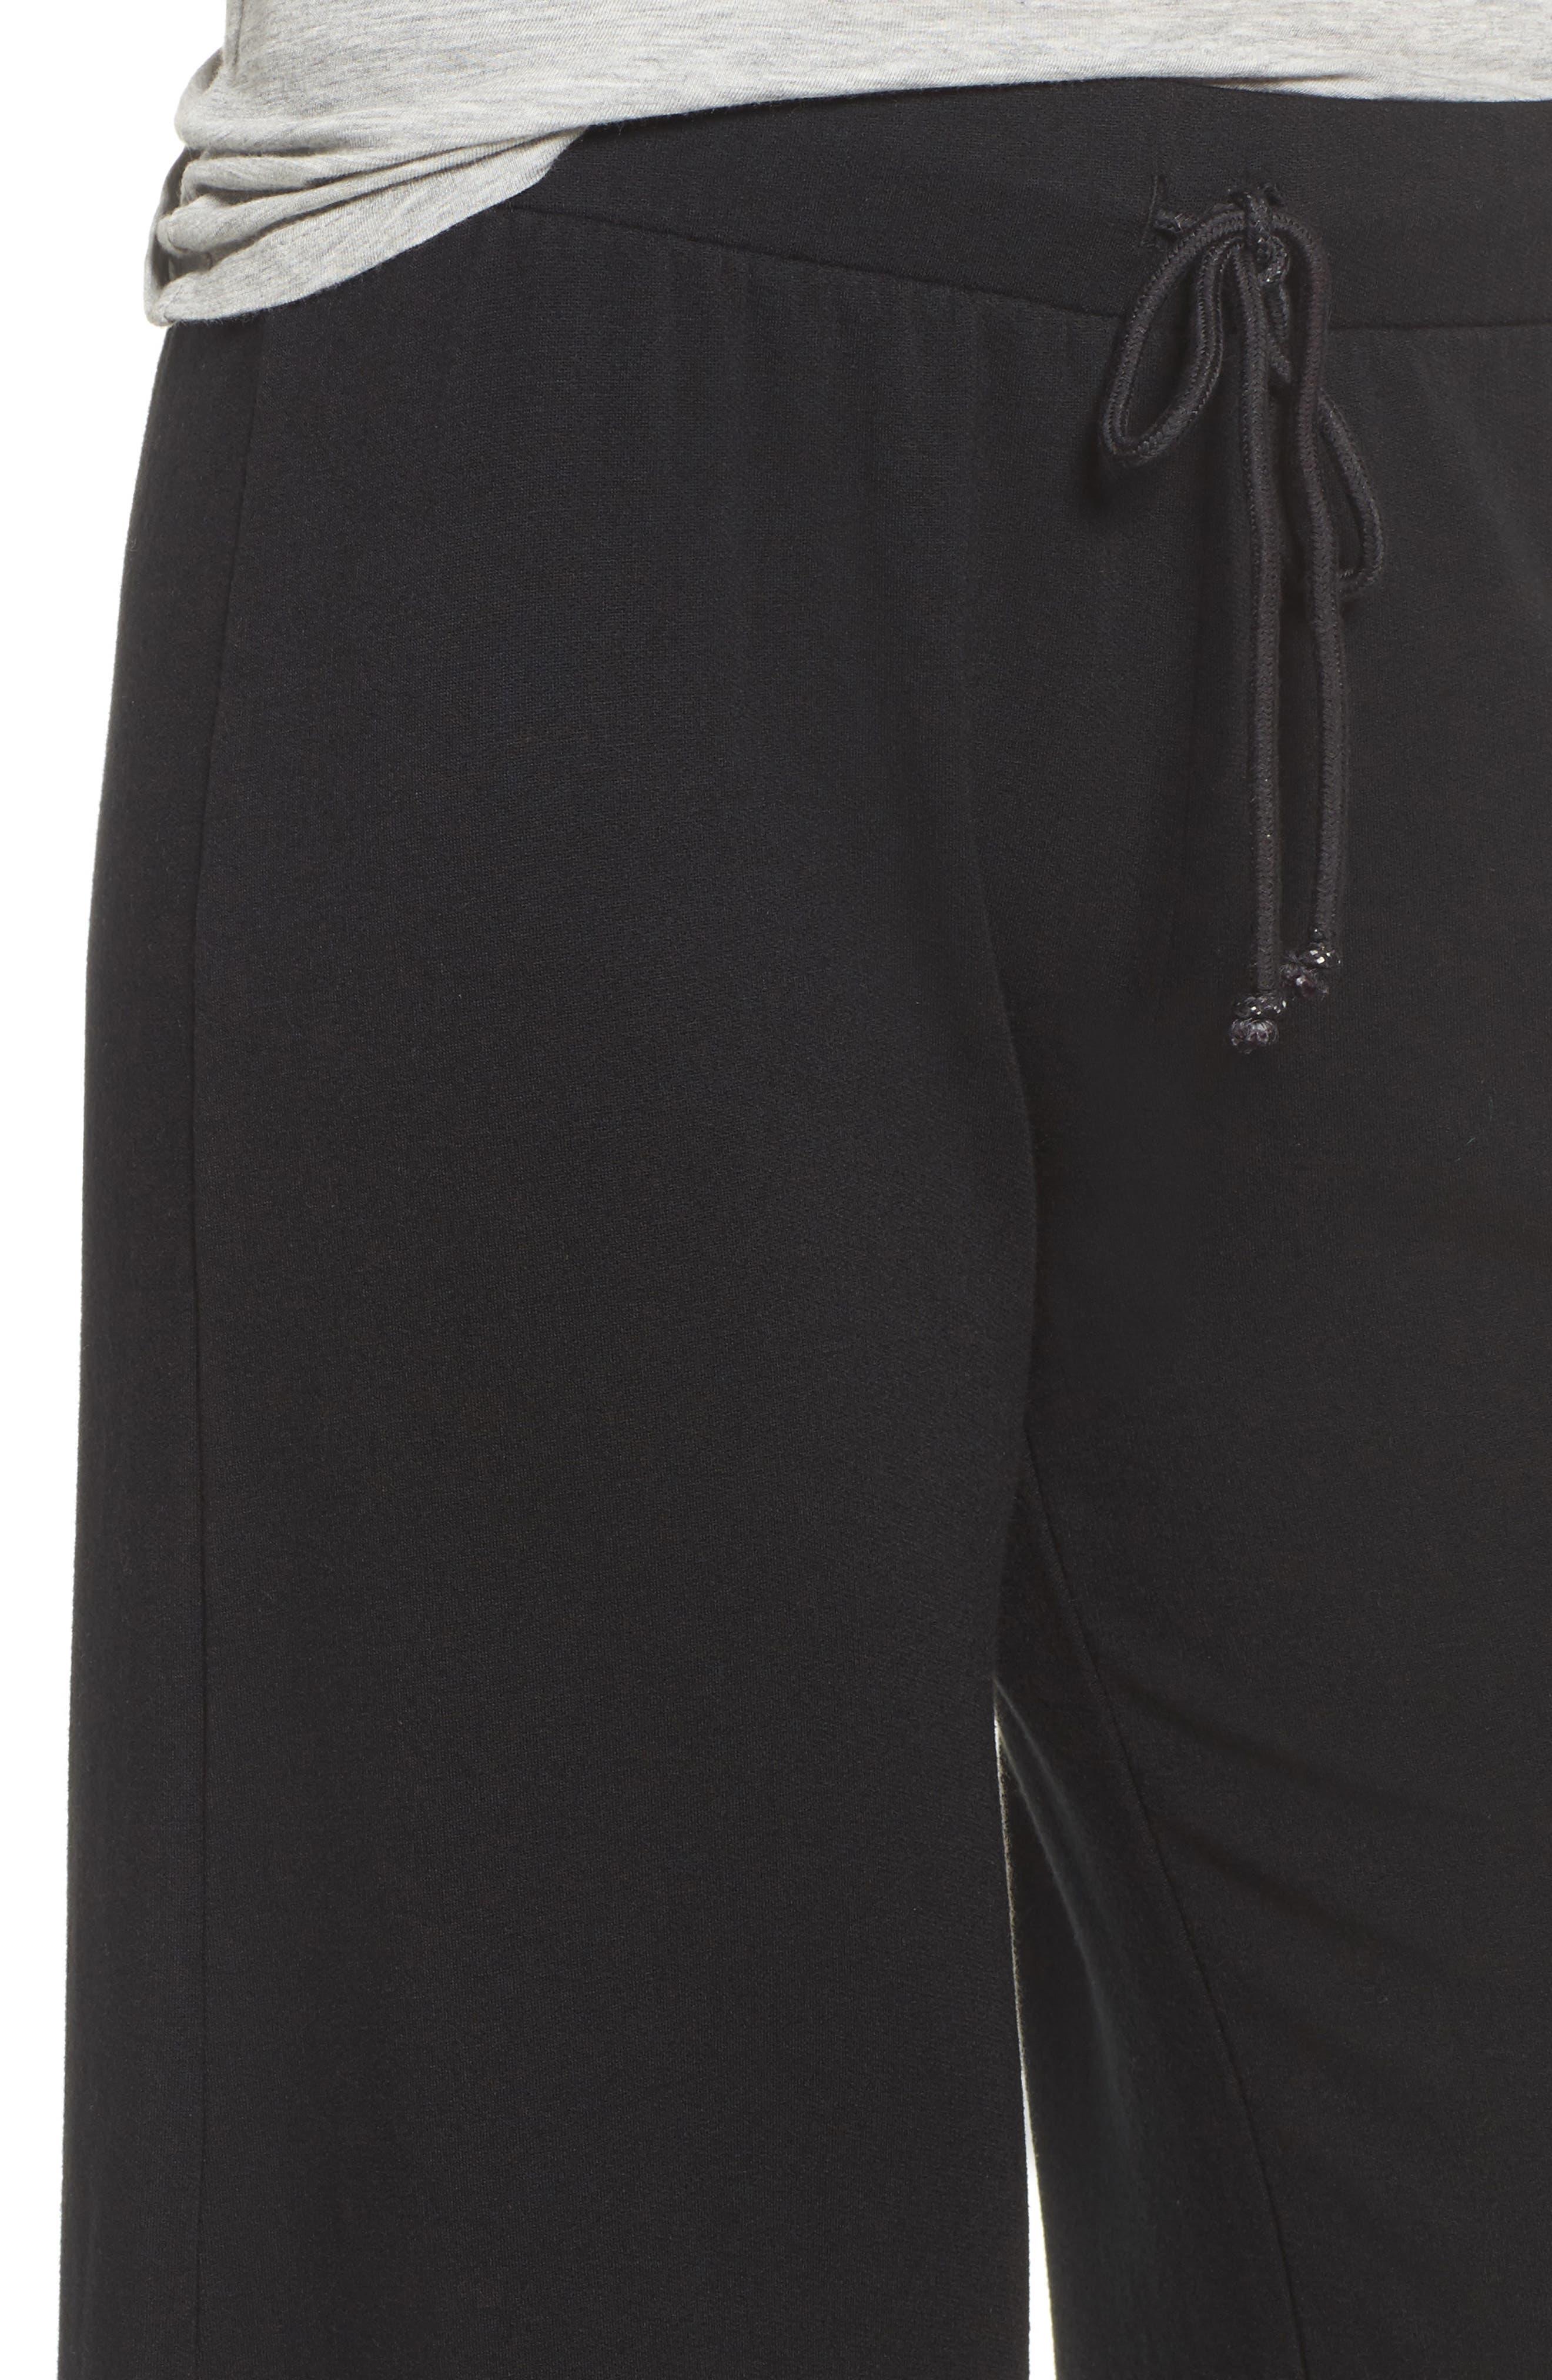 Drawstring Waist Wide Leg Pants,                             Alternate thumbnail 4, color,                             001